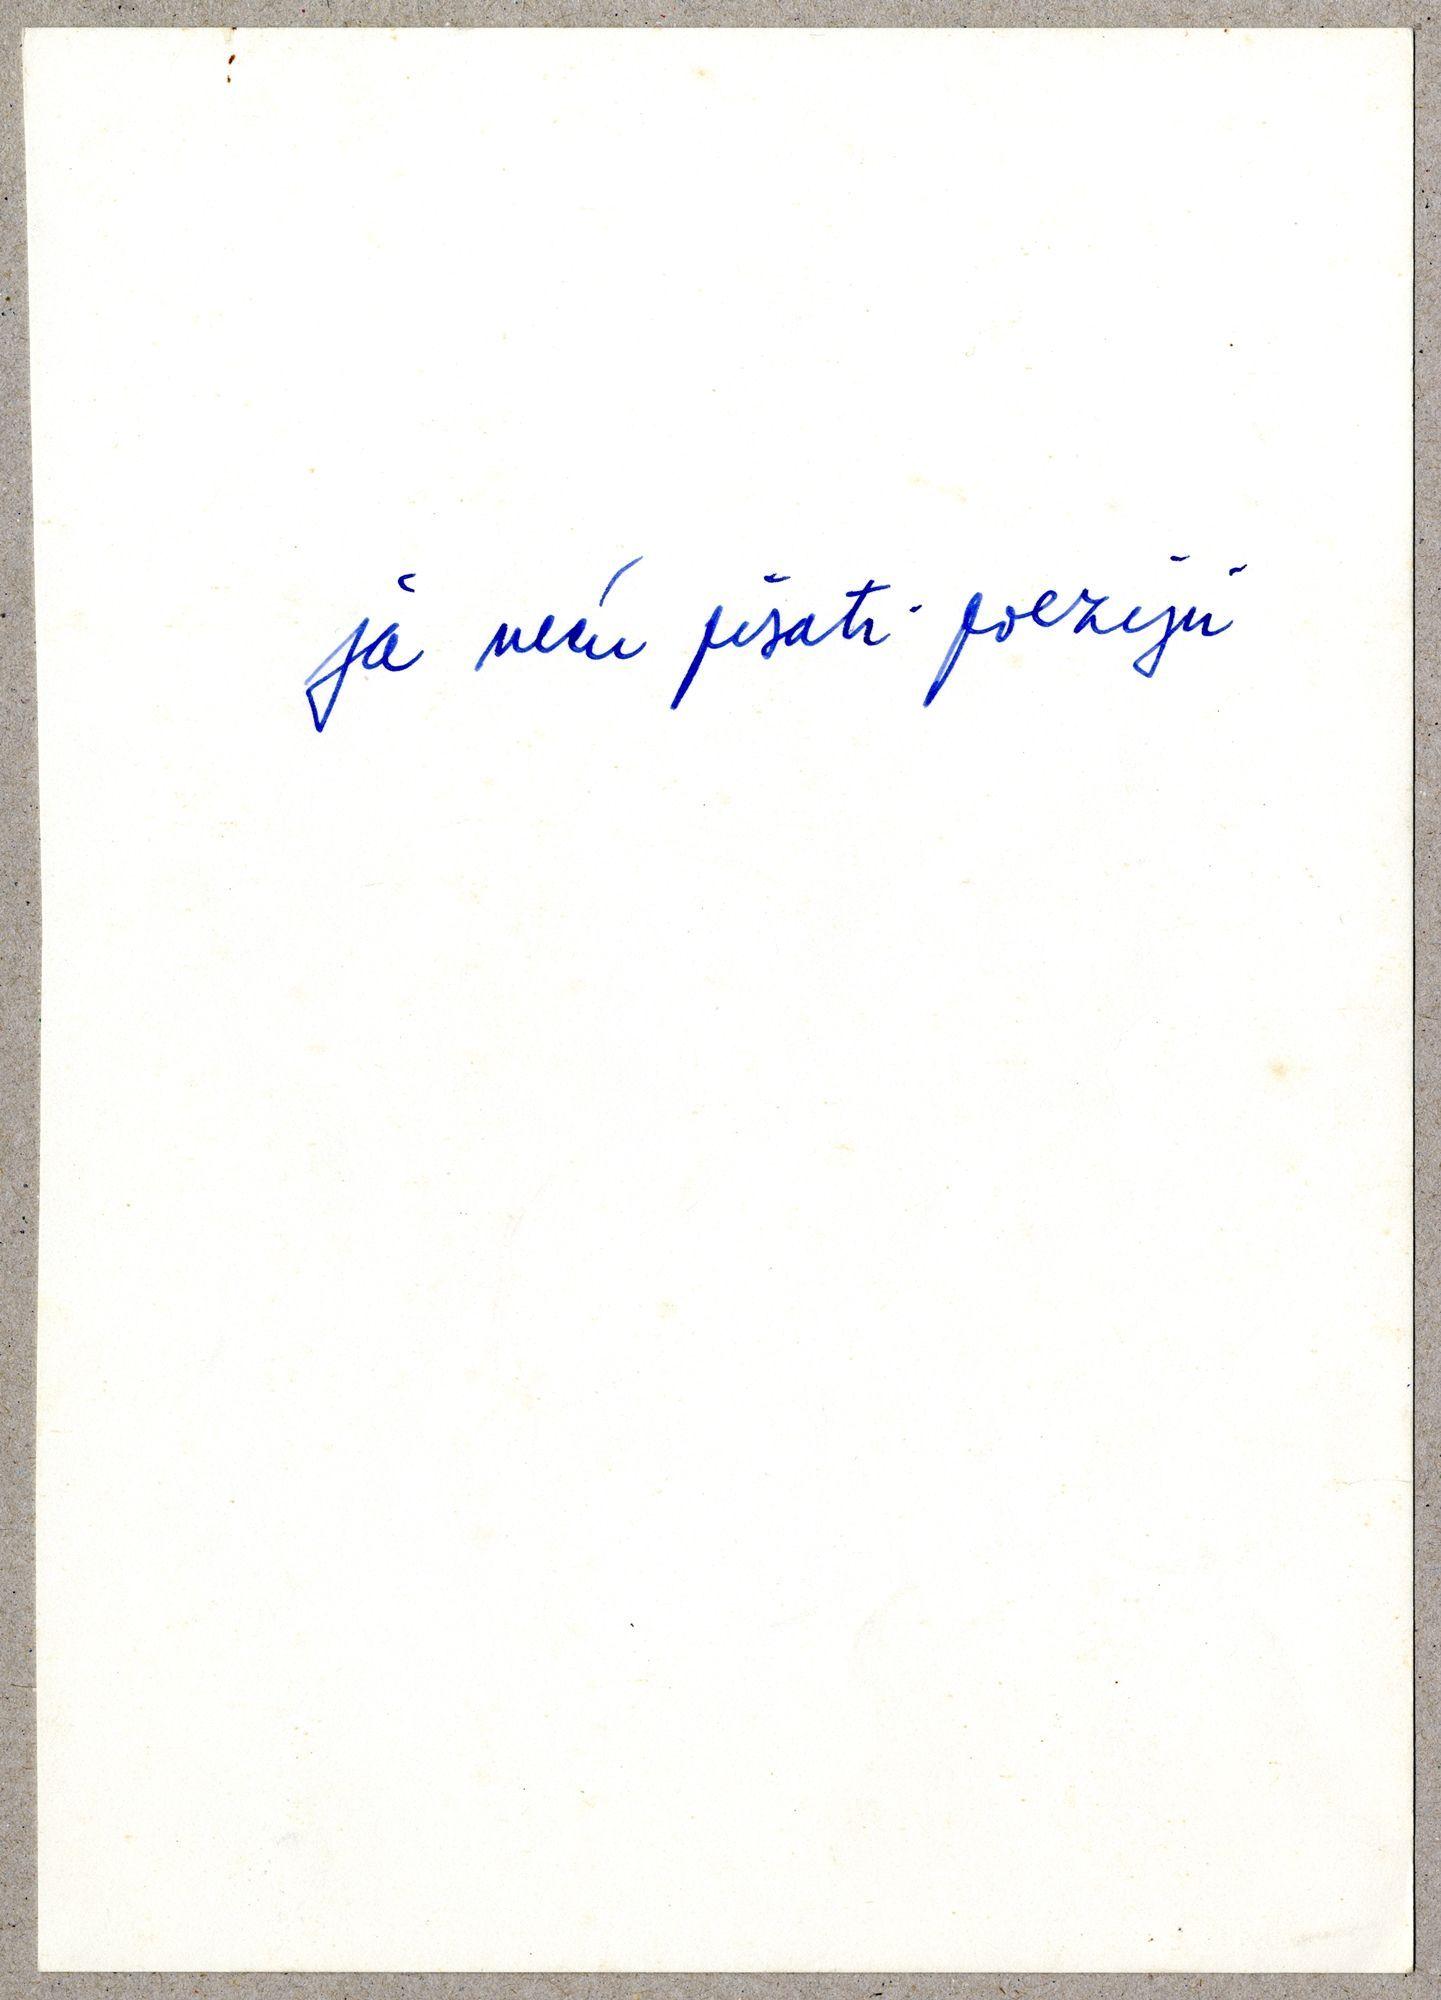 Vlado Martek, Ja necu pisati poeziju